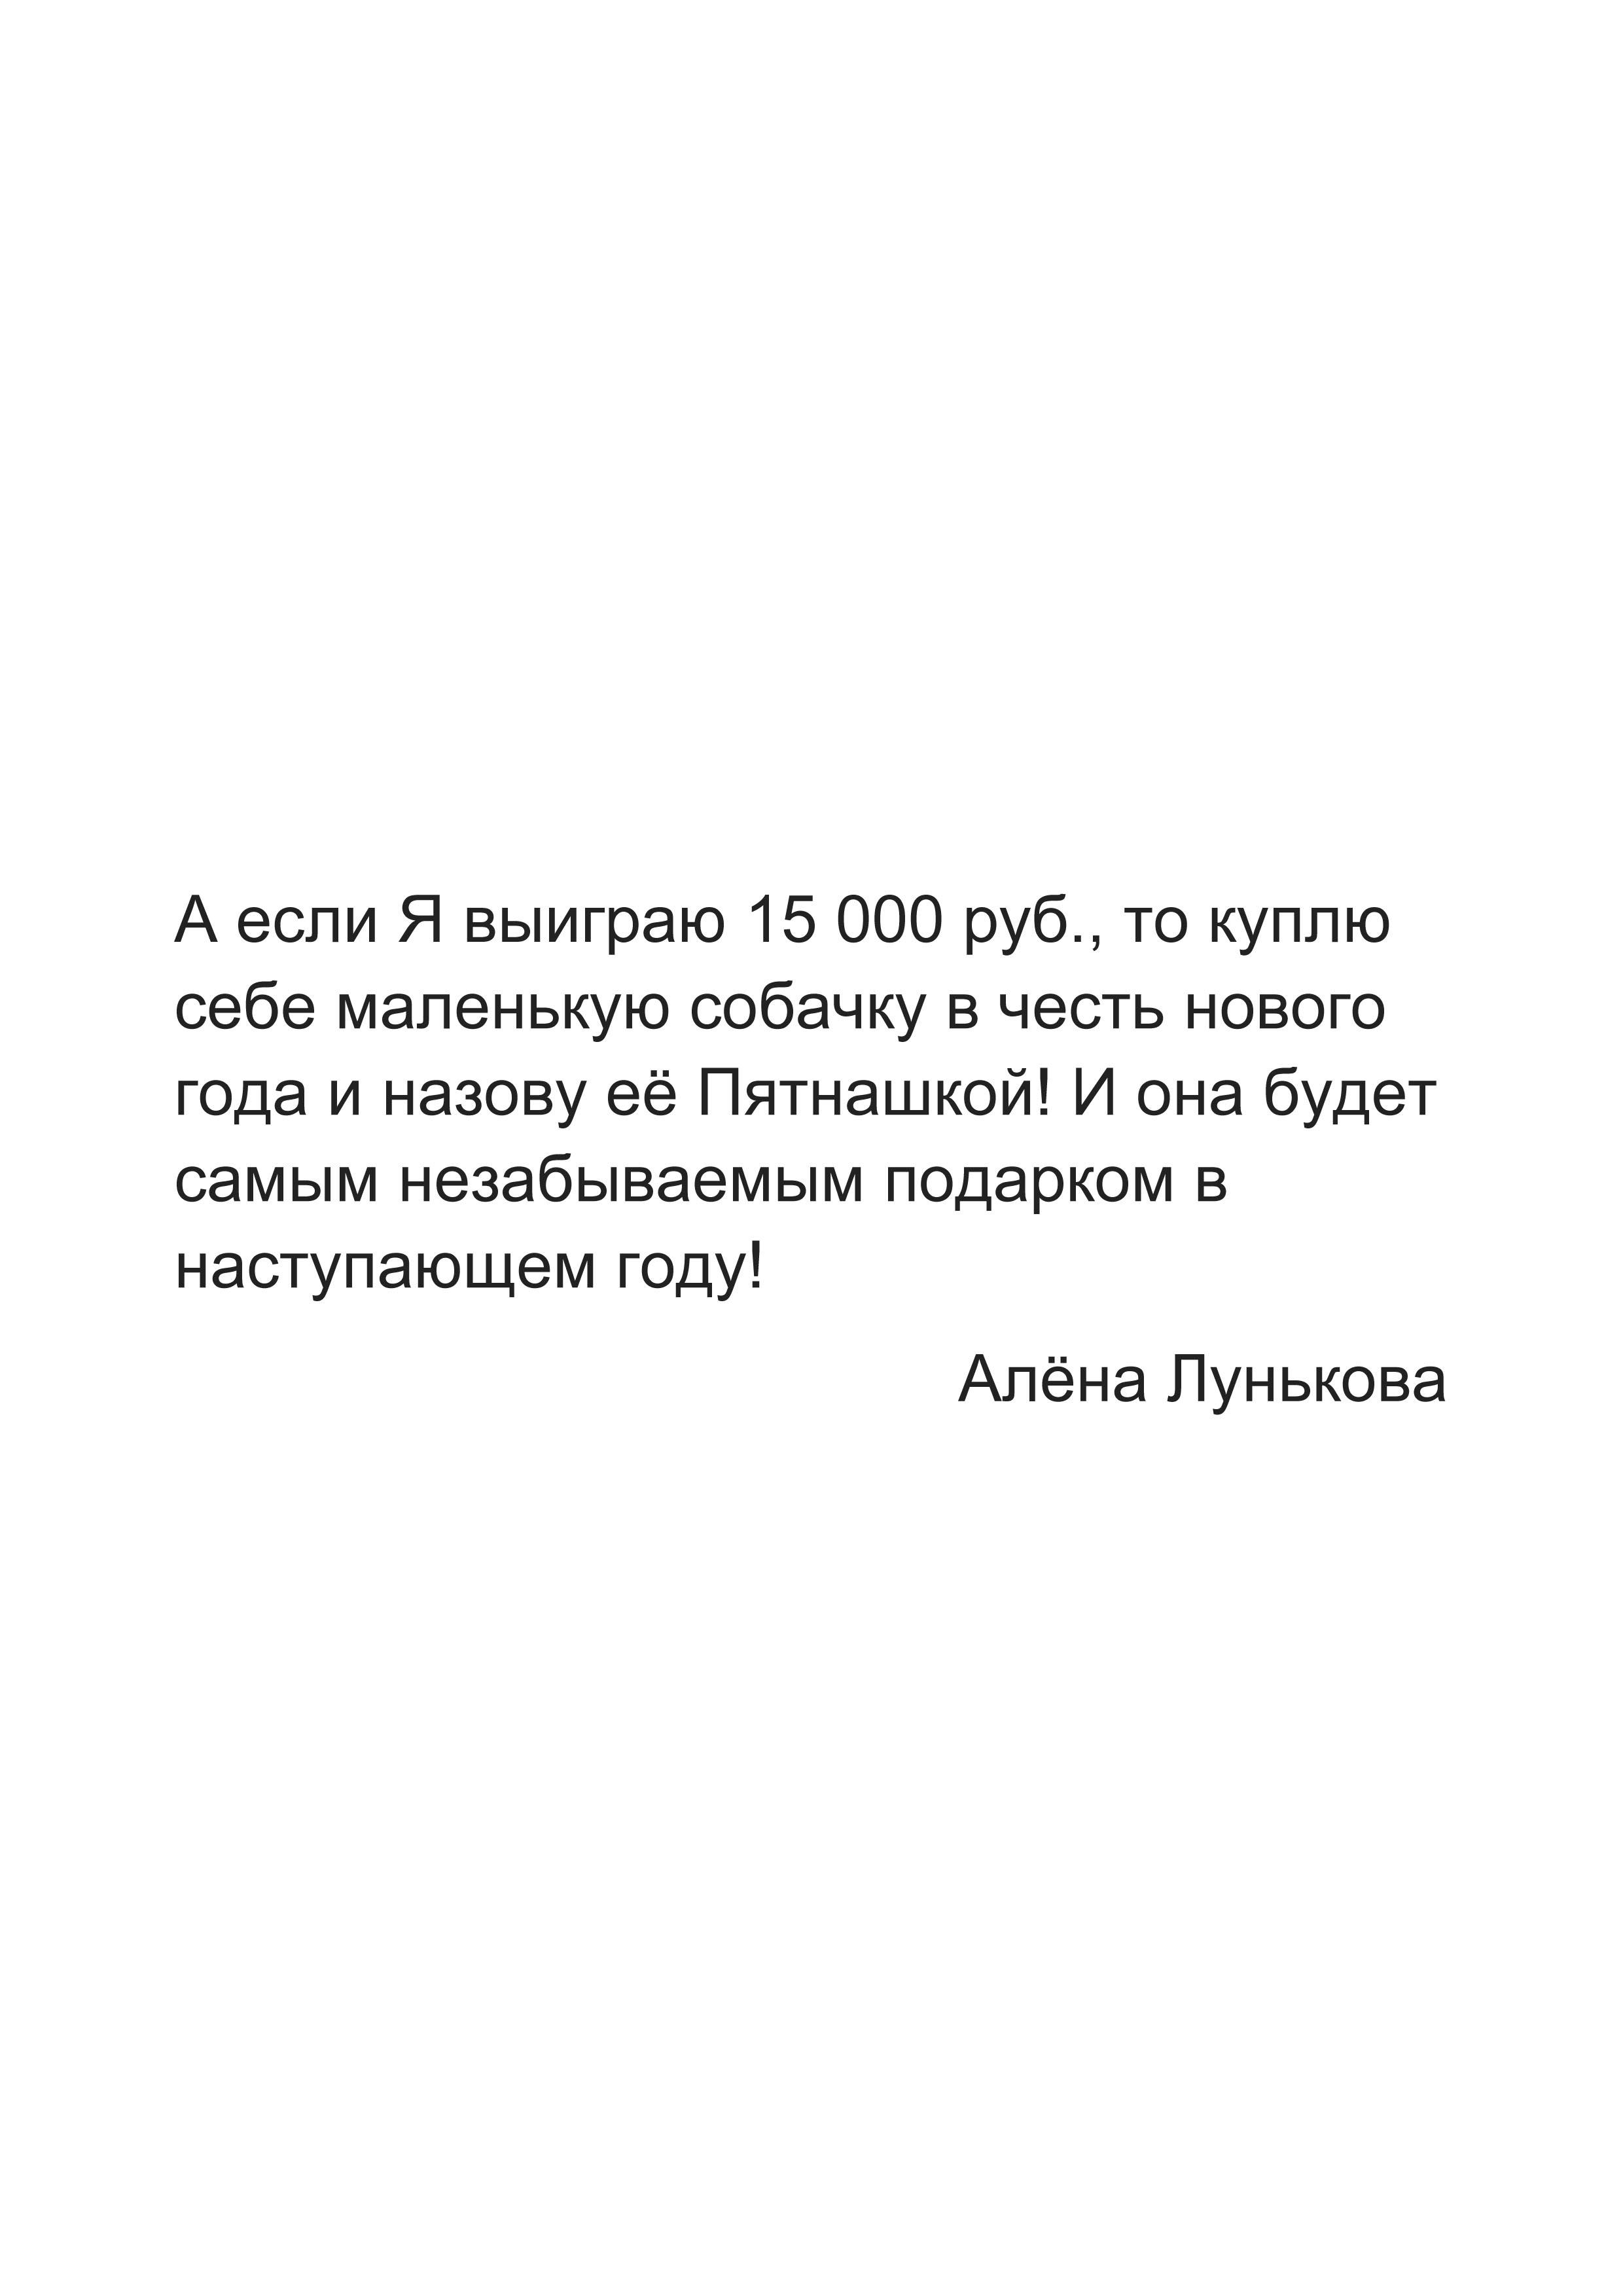 Алёна Лунькова